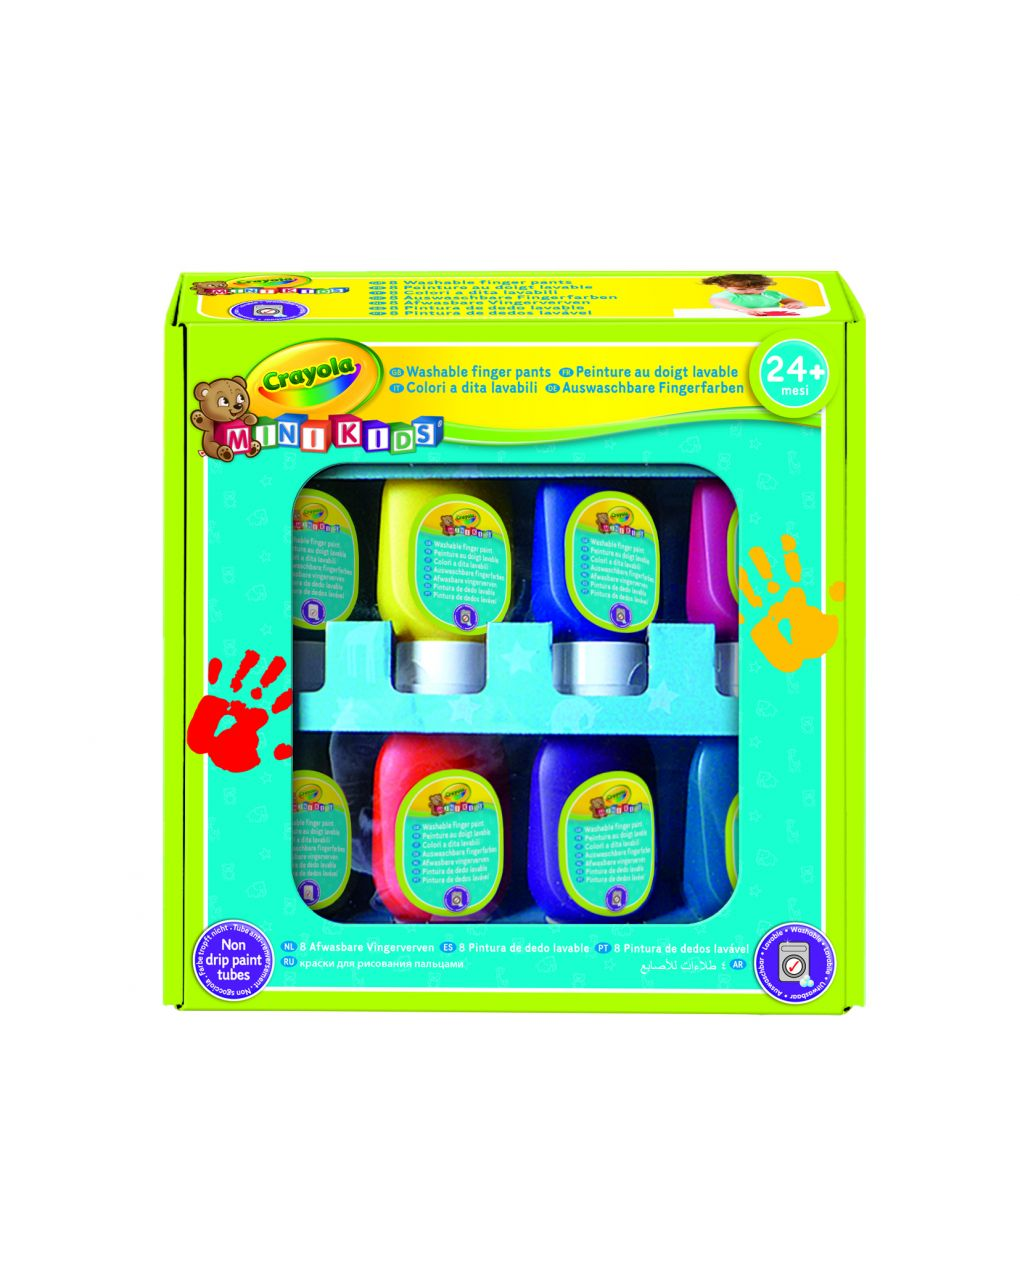 Crayola - set pitturare con le dita mini kids - Crayola